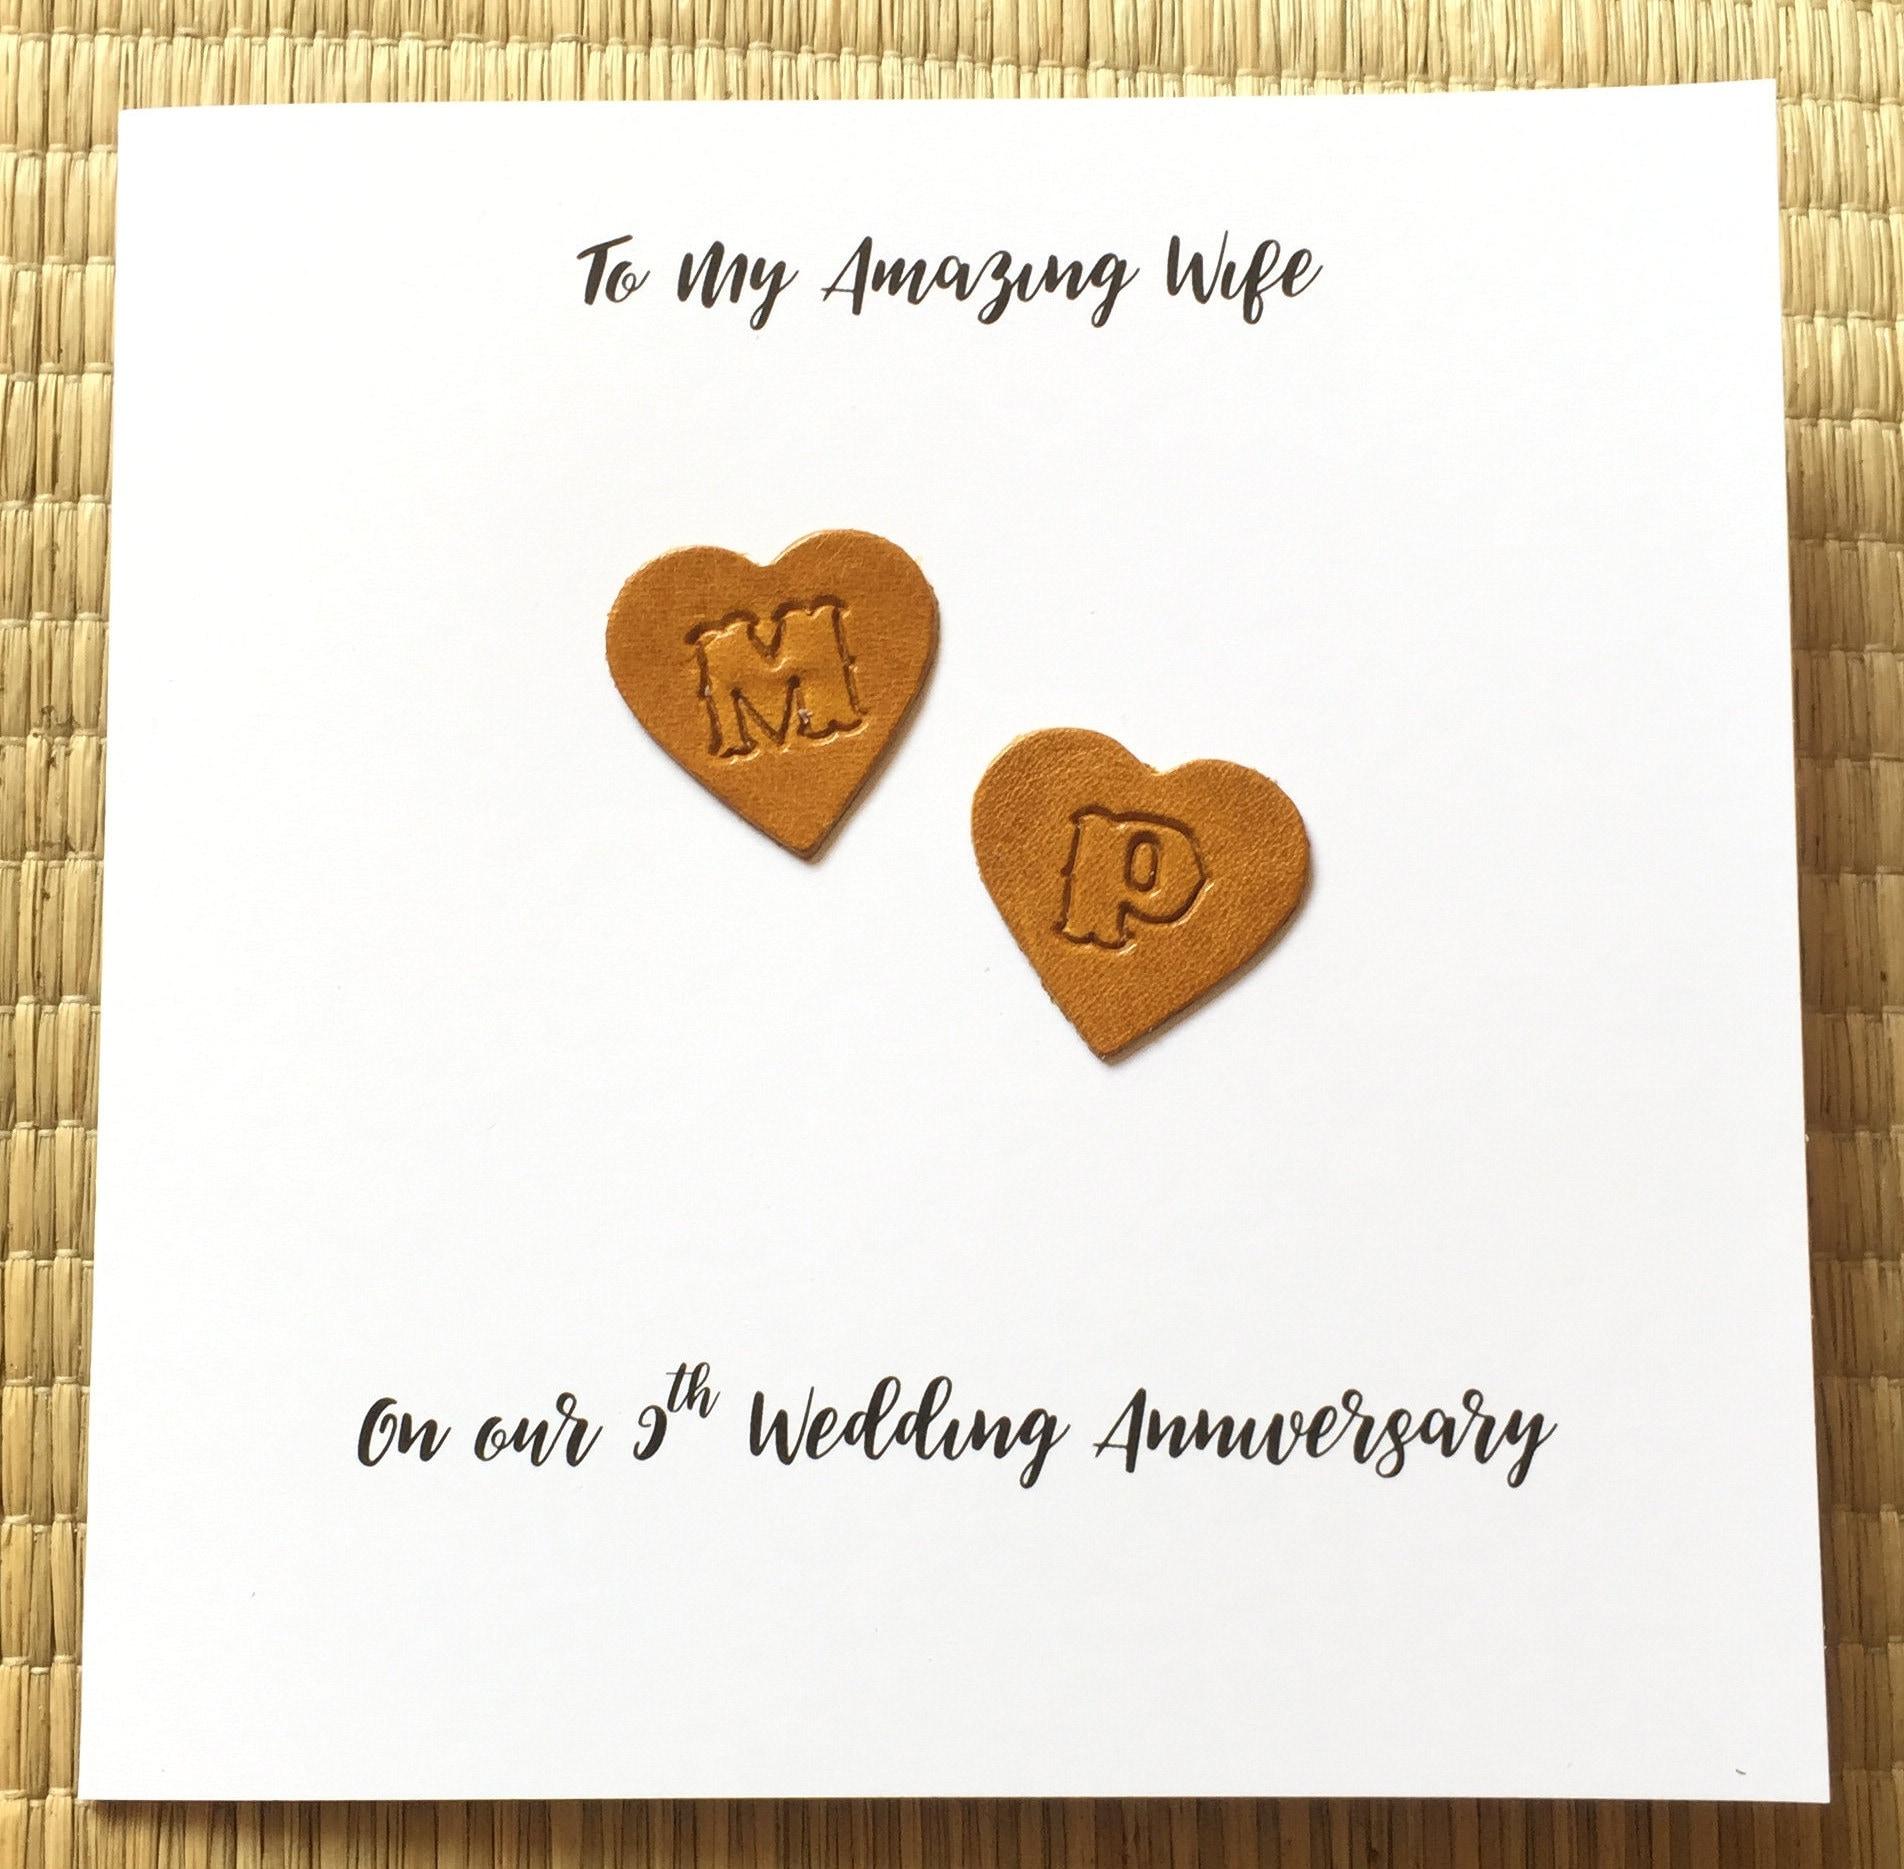 Personalised 9th Wedding Anniversary Card Leather Anniversary Caramel Hearts Handmade